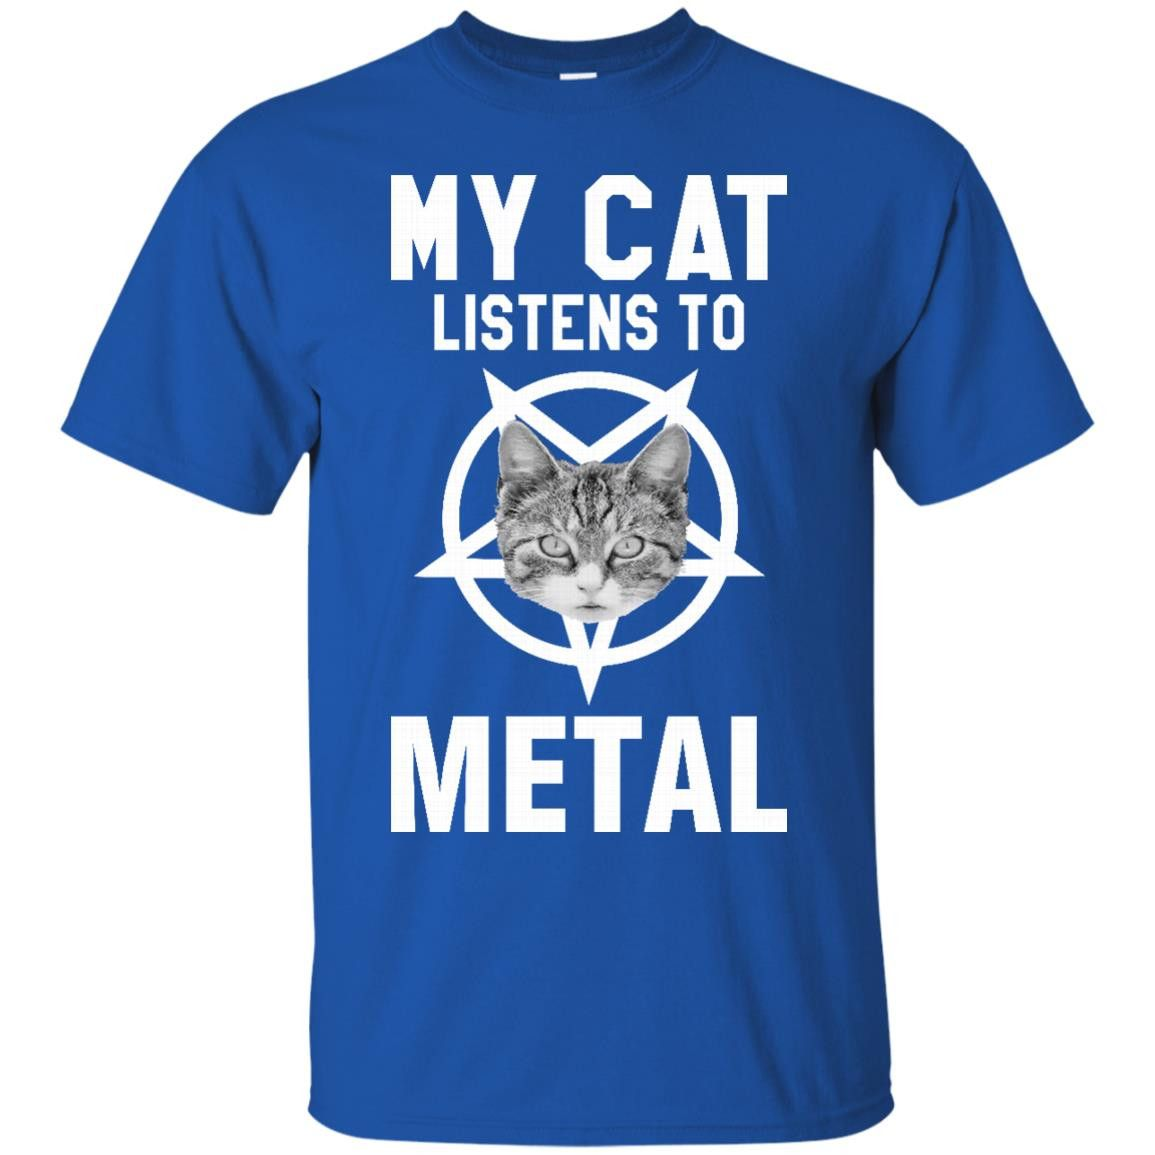 Cat Metal Rock Shirts My Cat Listens To Metal T-Shirts Hoodies Sweatshirts